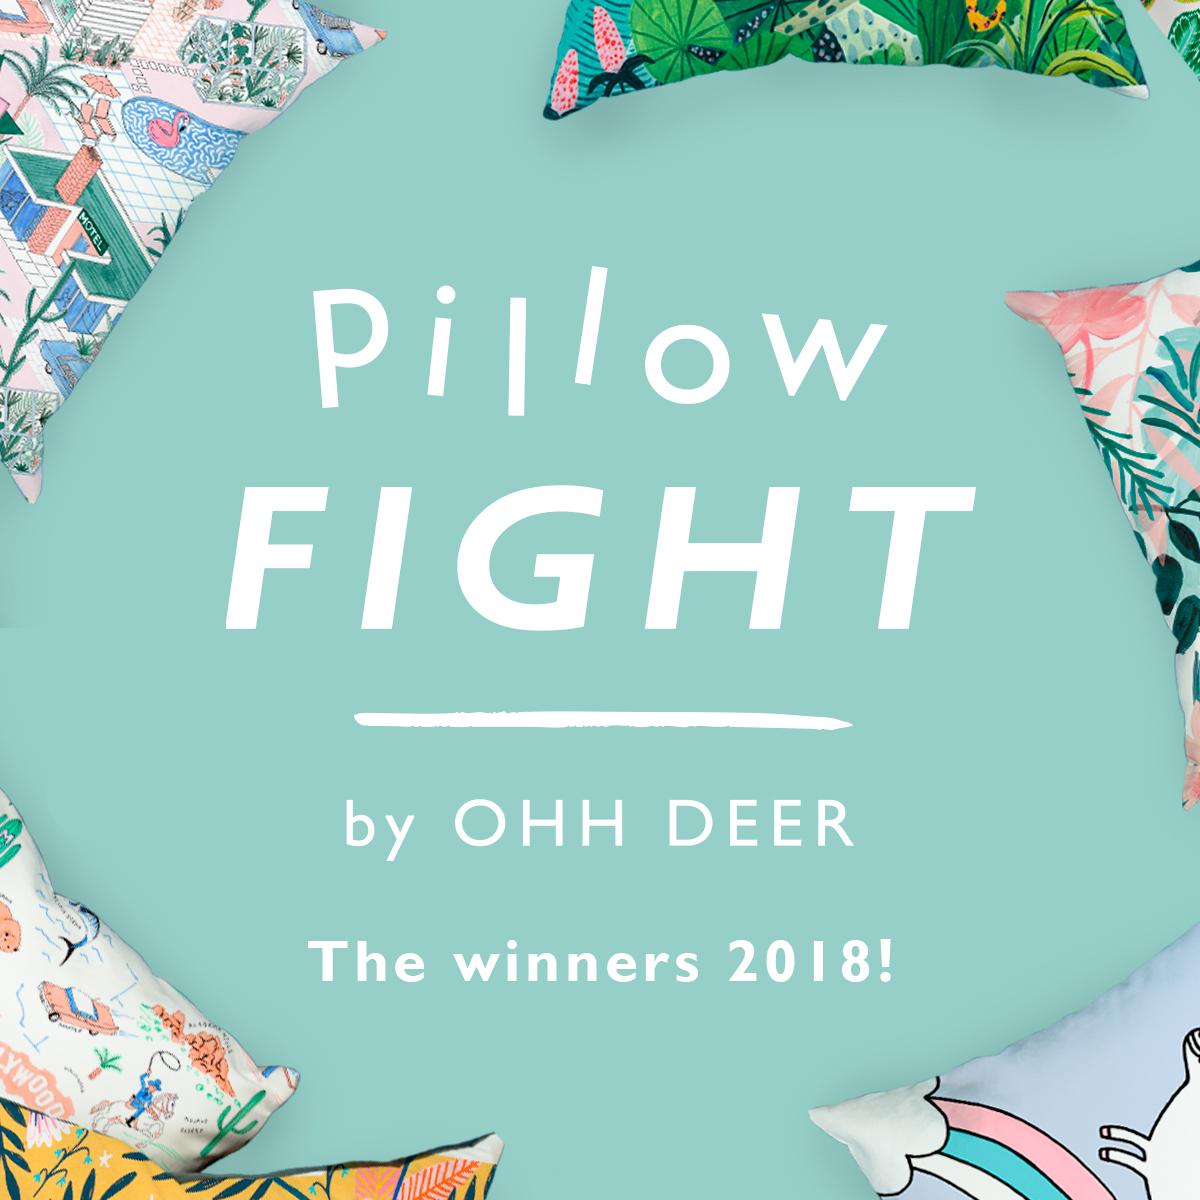 Pillow-Fight-2018-Winners.jpg